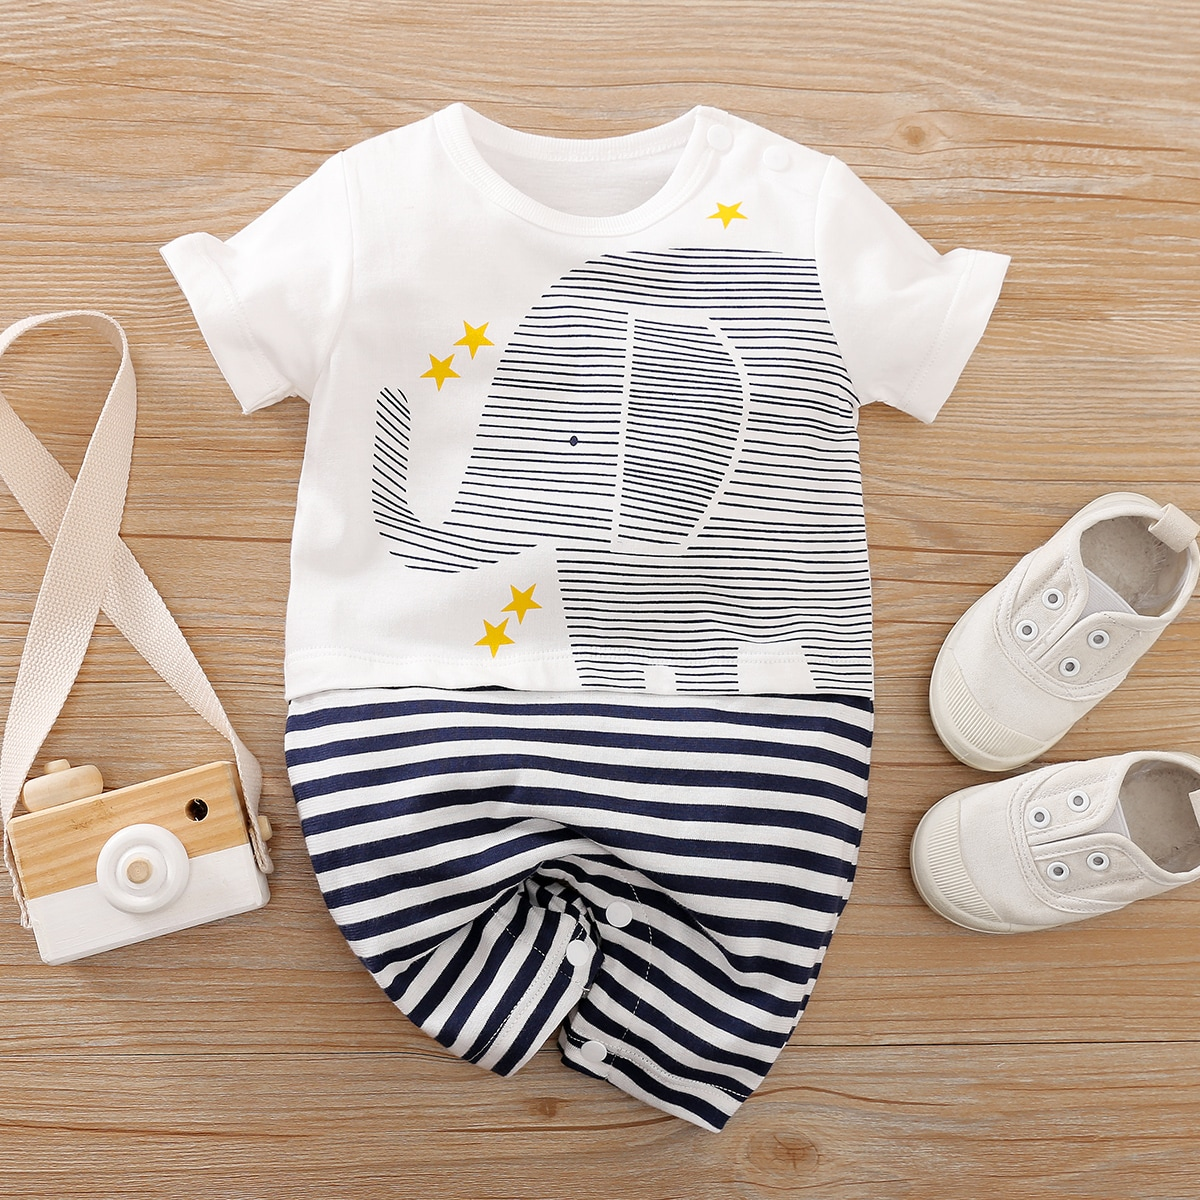 Baby Boy Cartoon & Striped Graphic Romper